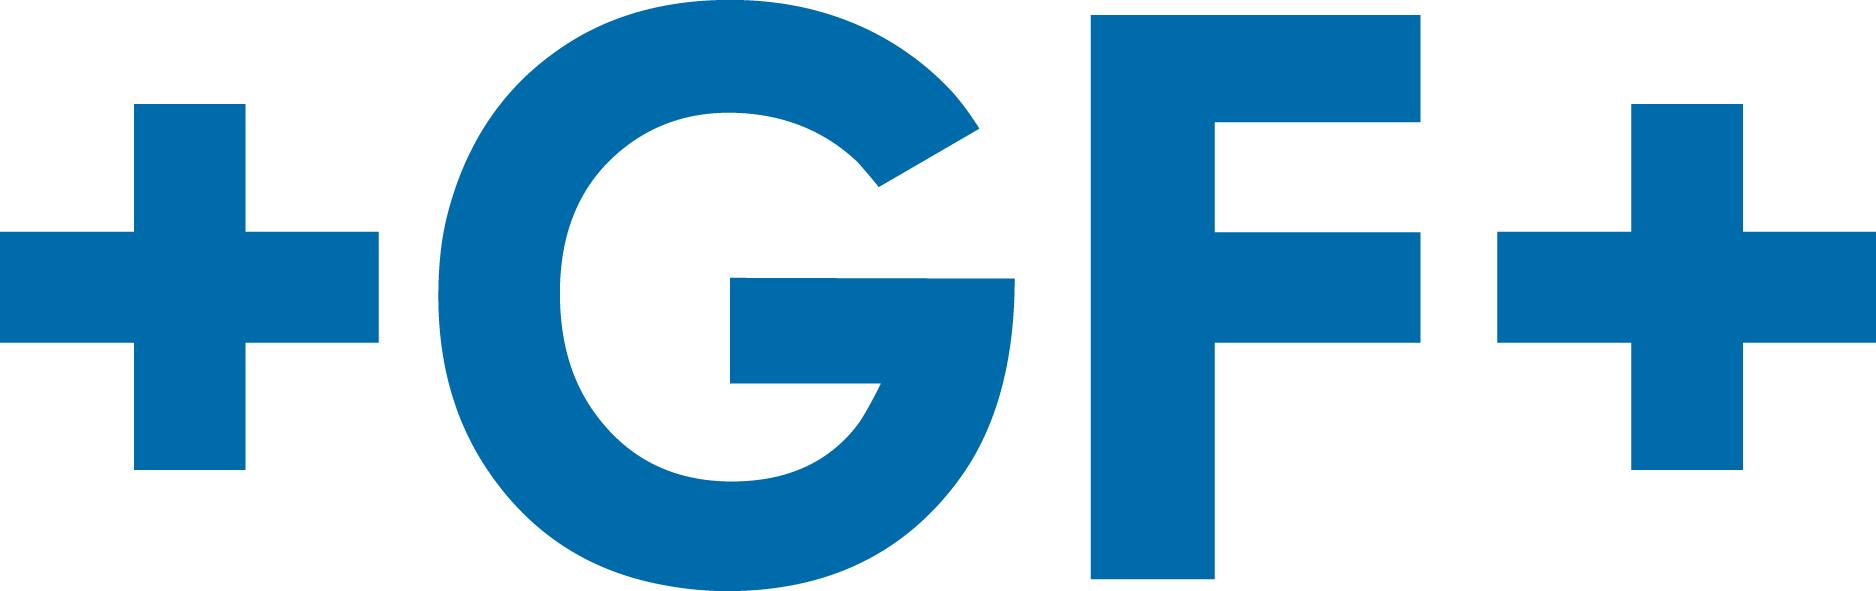 GF Machining Solutions Ltd - Coventry, West Midlands CV2 2SJ - 02476 538650 | ShowMeLocal.com